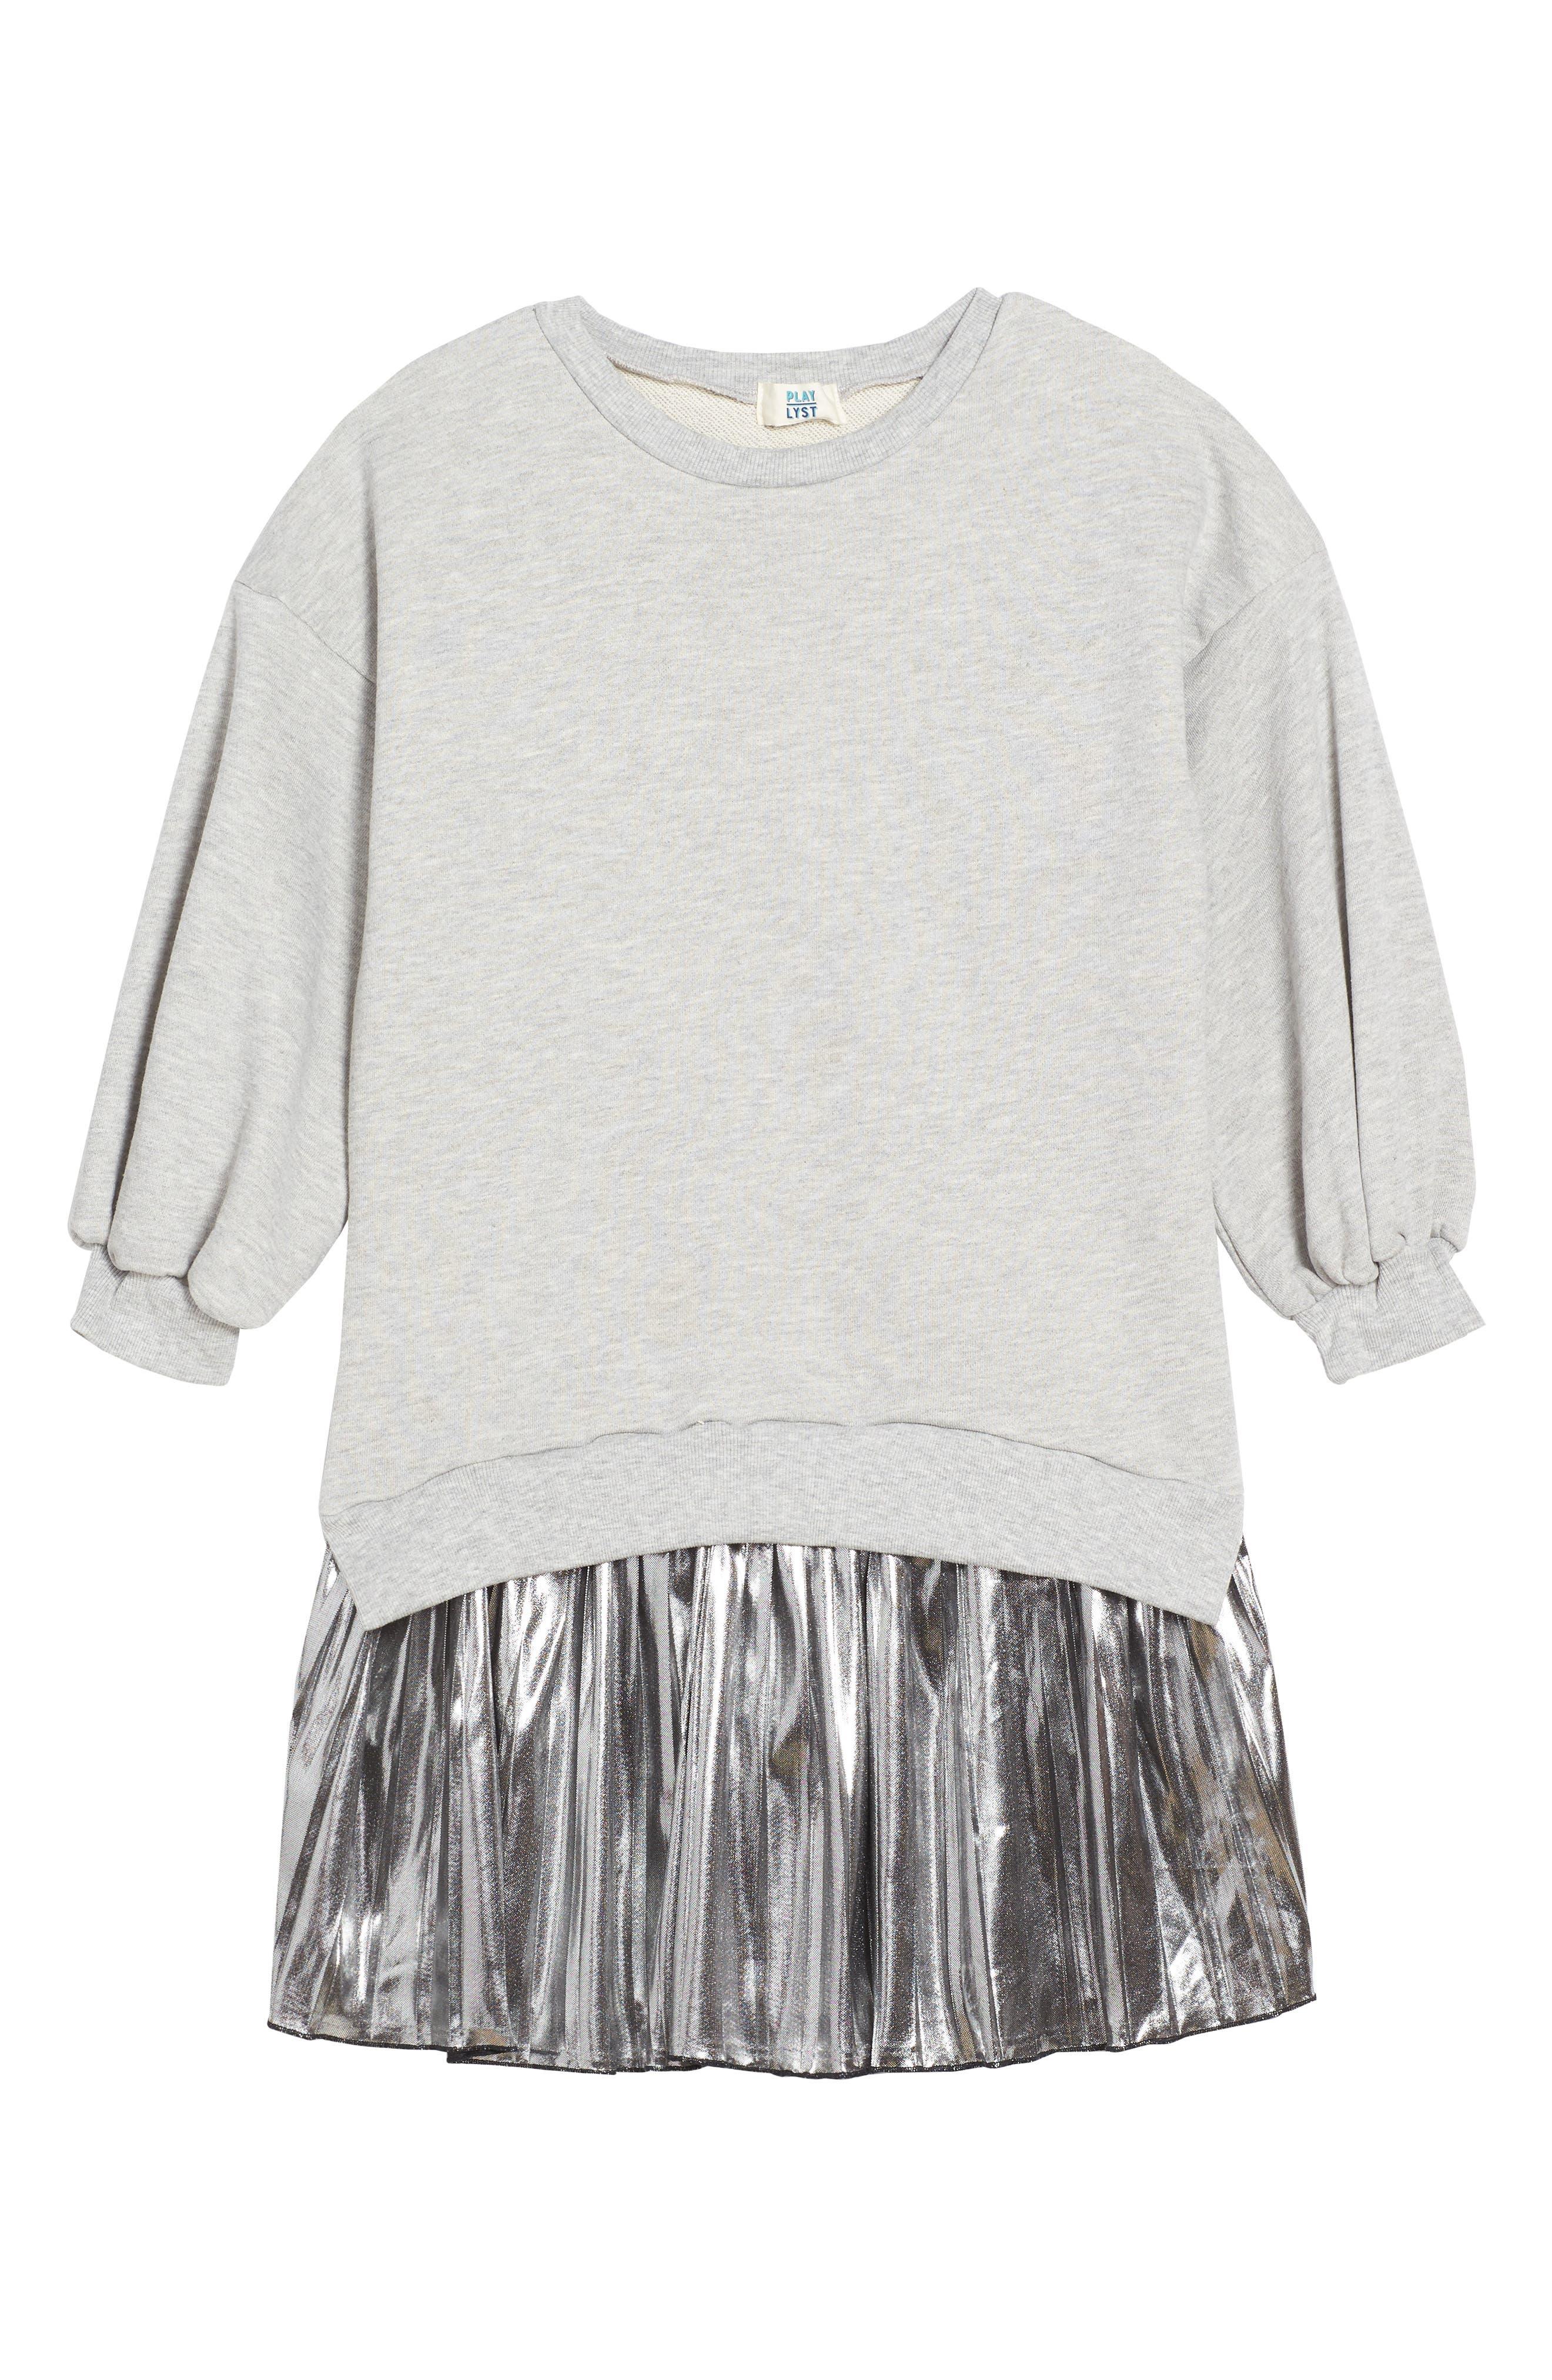 Metallic Sweatshirt Dress,                             Main thumbnail 1, color,                             020